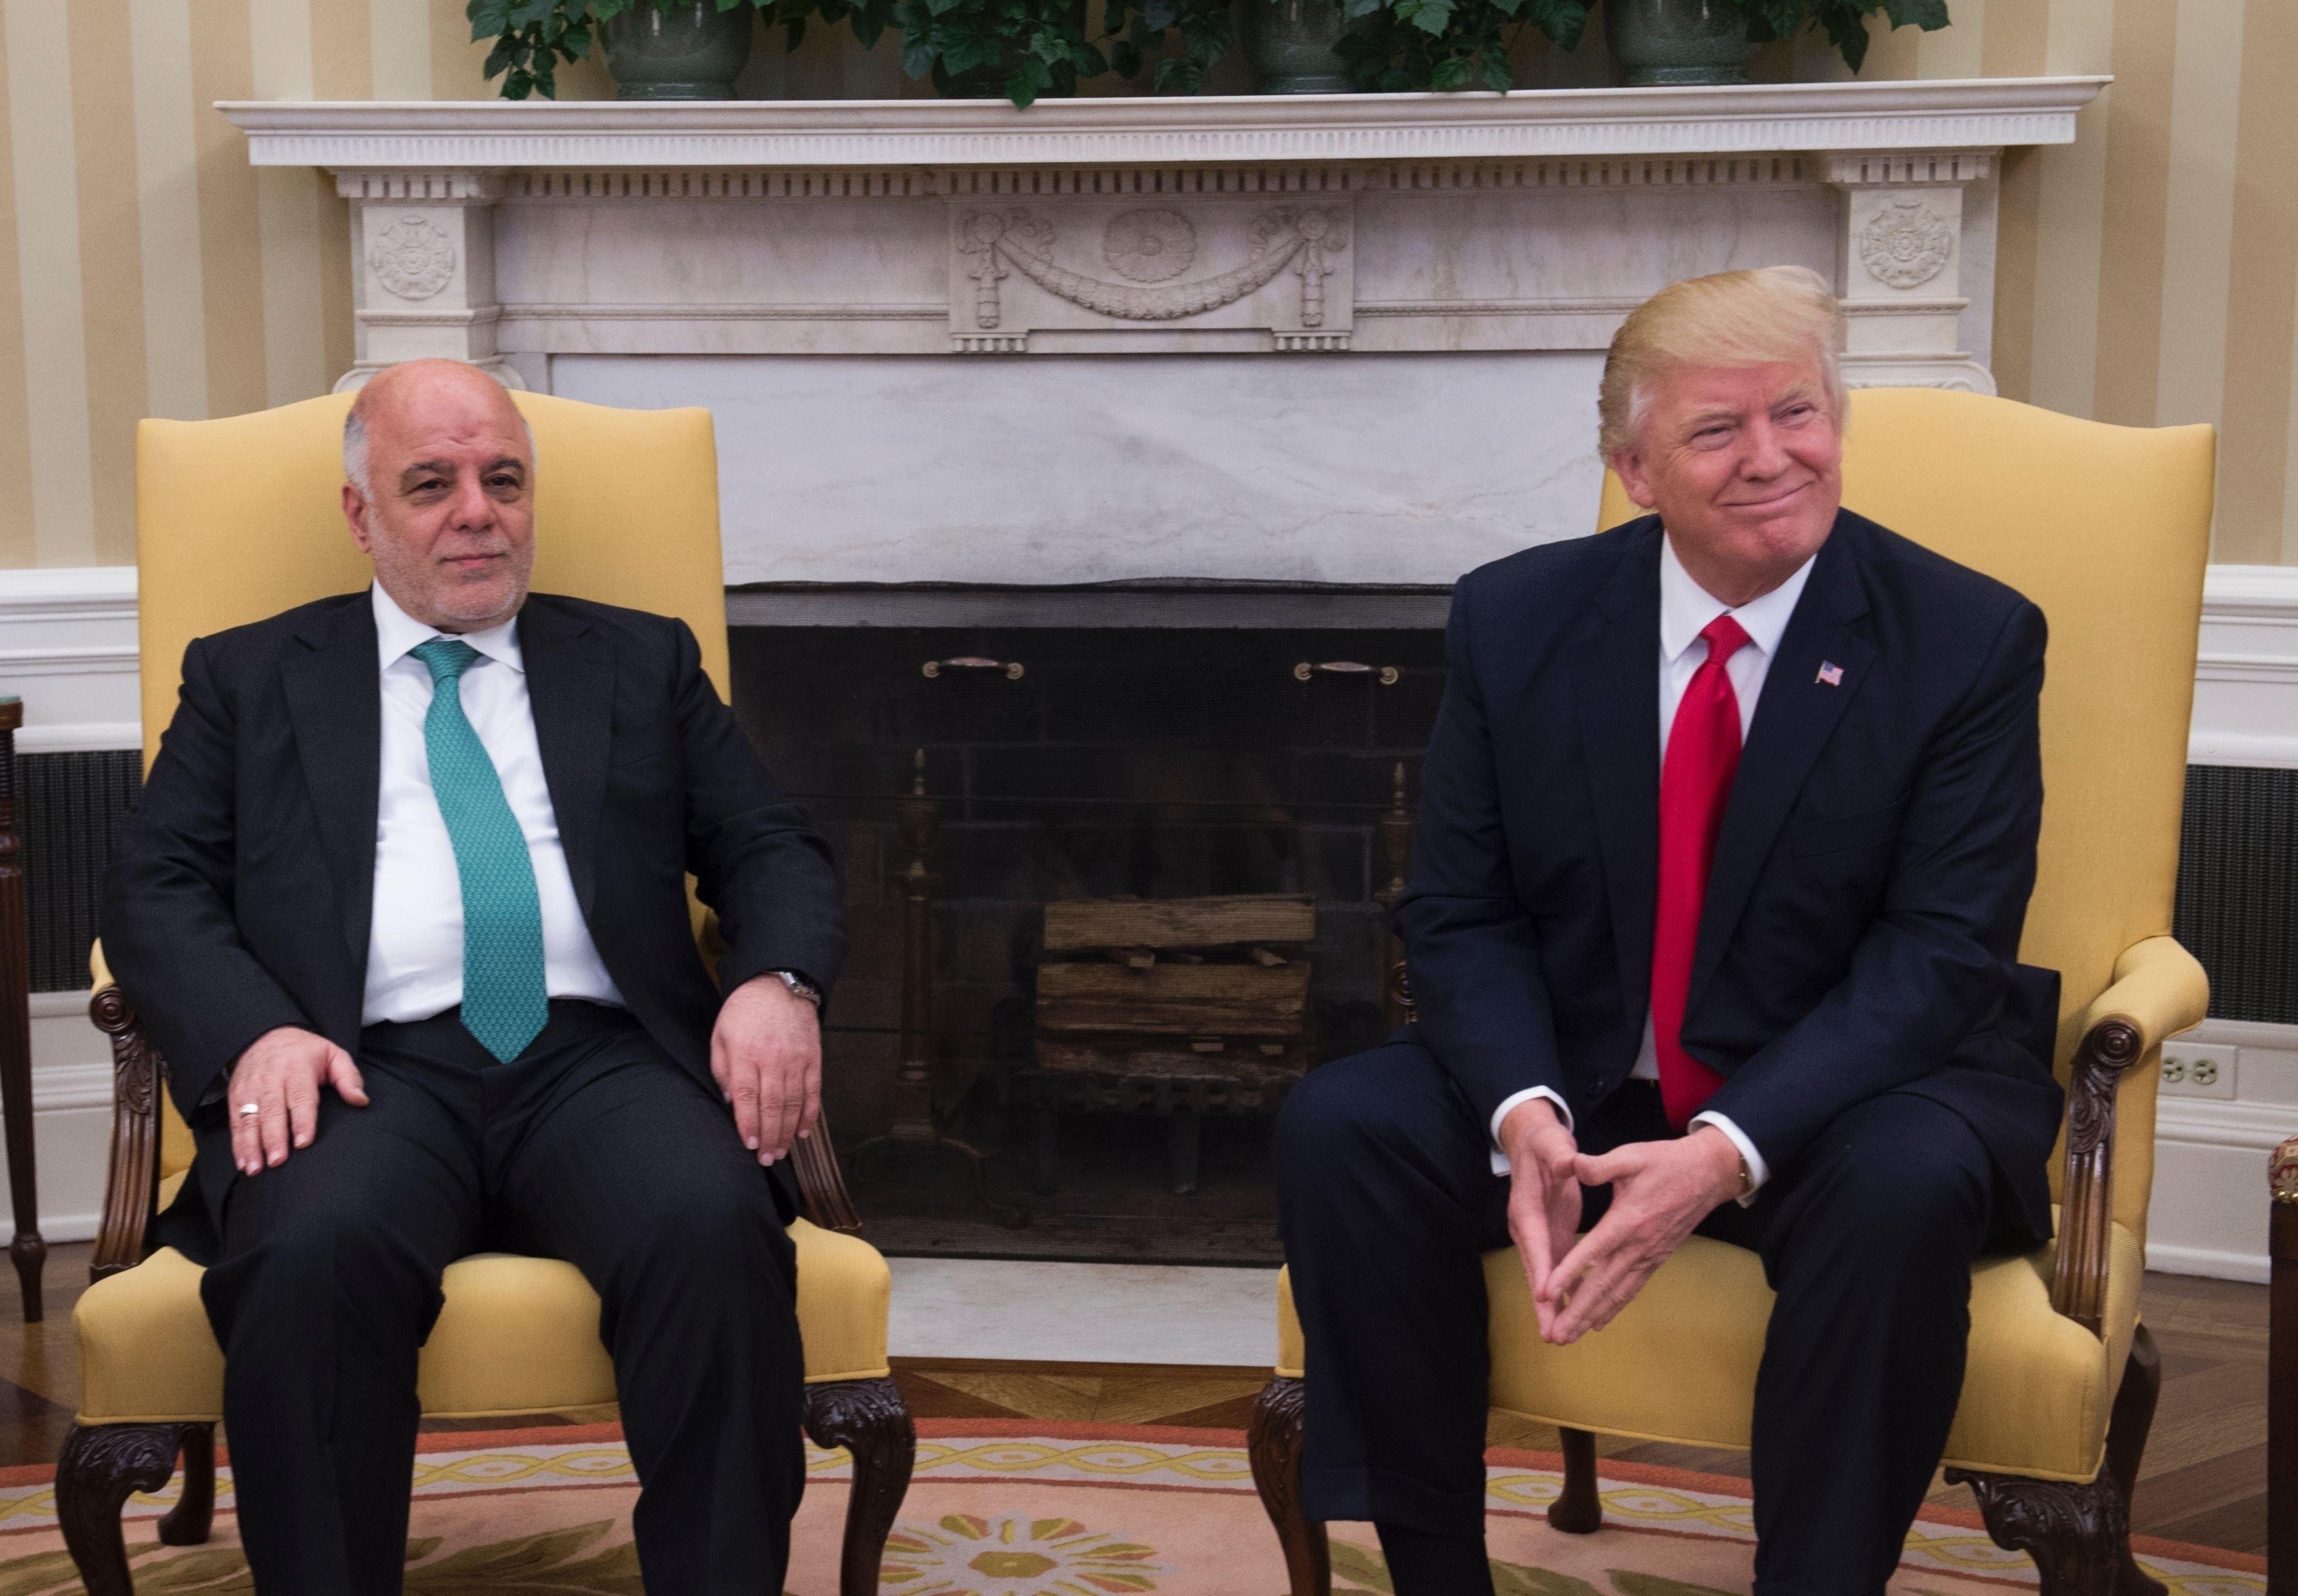 recapturing oval office. Recapturing Oval Office H